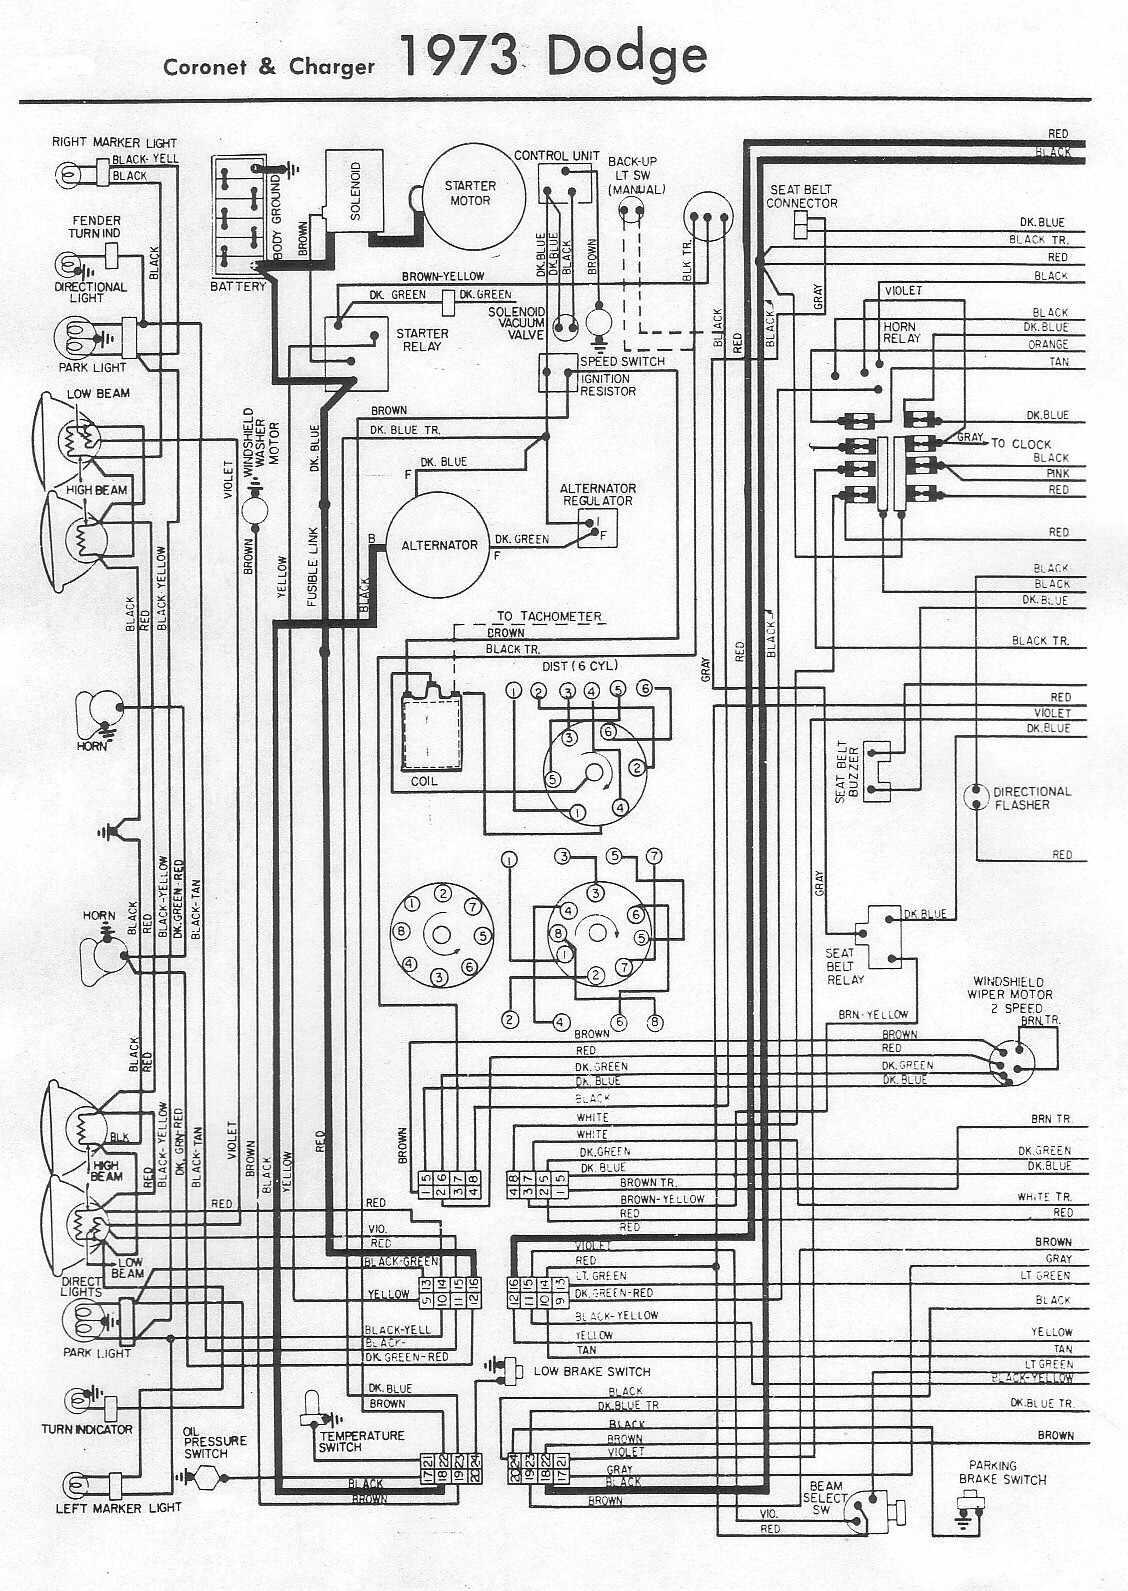 medium resolution of citroen saxo fuse box layout wiring librarycitroen saxo fuse box diagram wiring diagrams source blazer